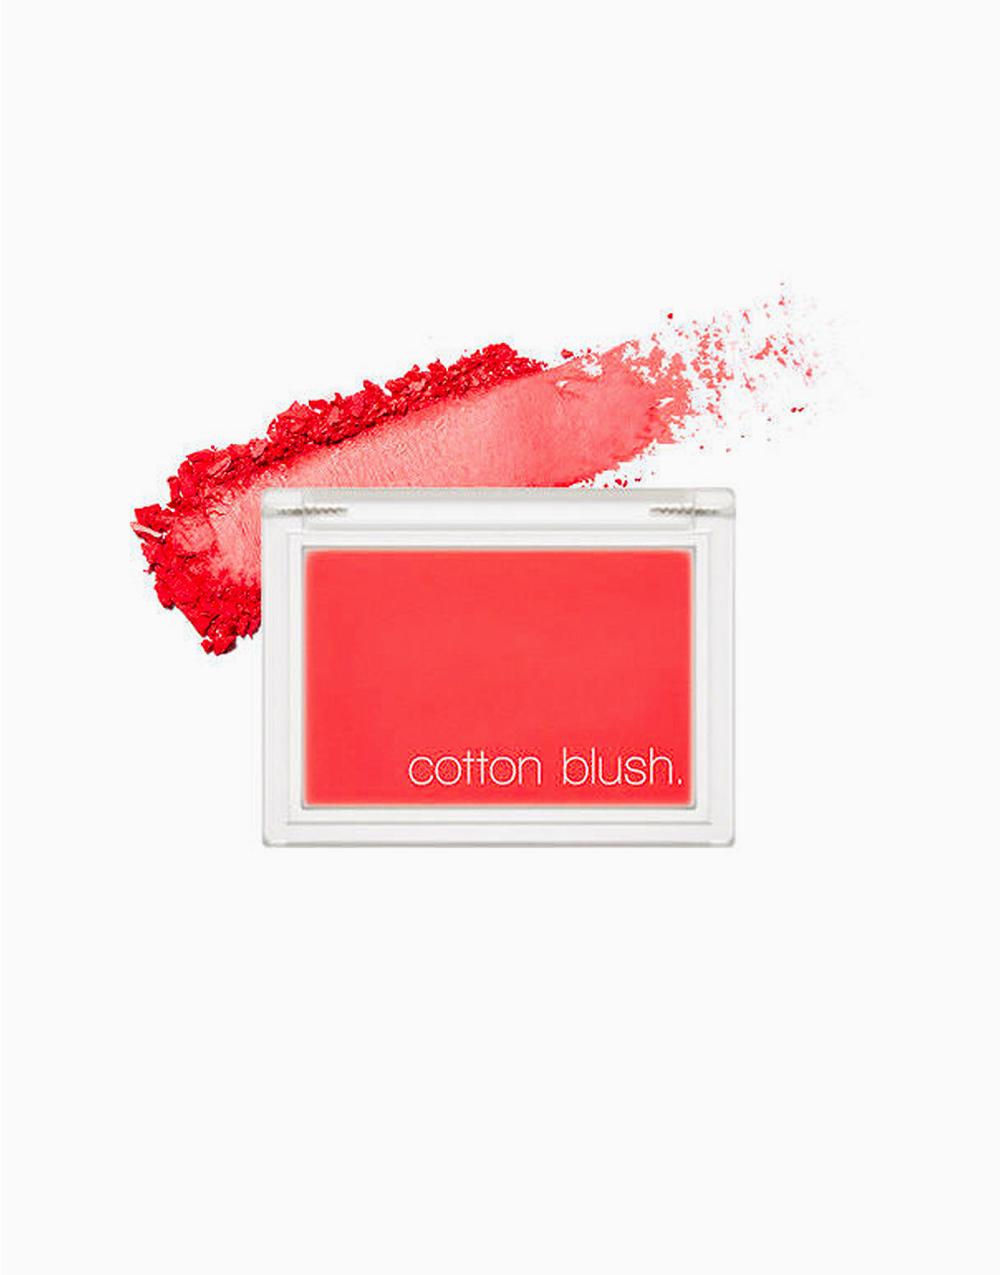 Cotton Blush by Missha | Red Flat